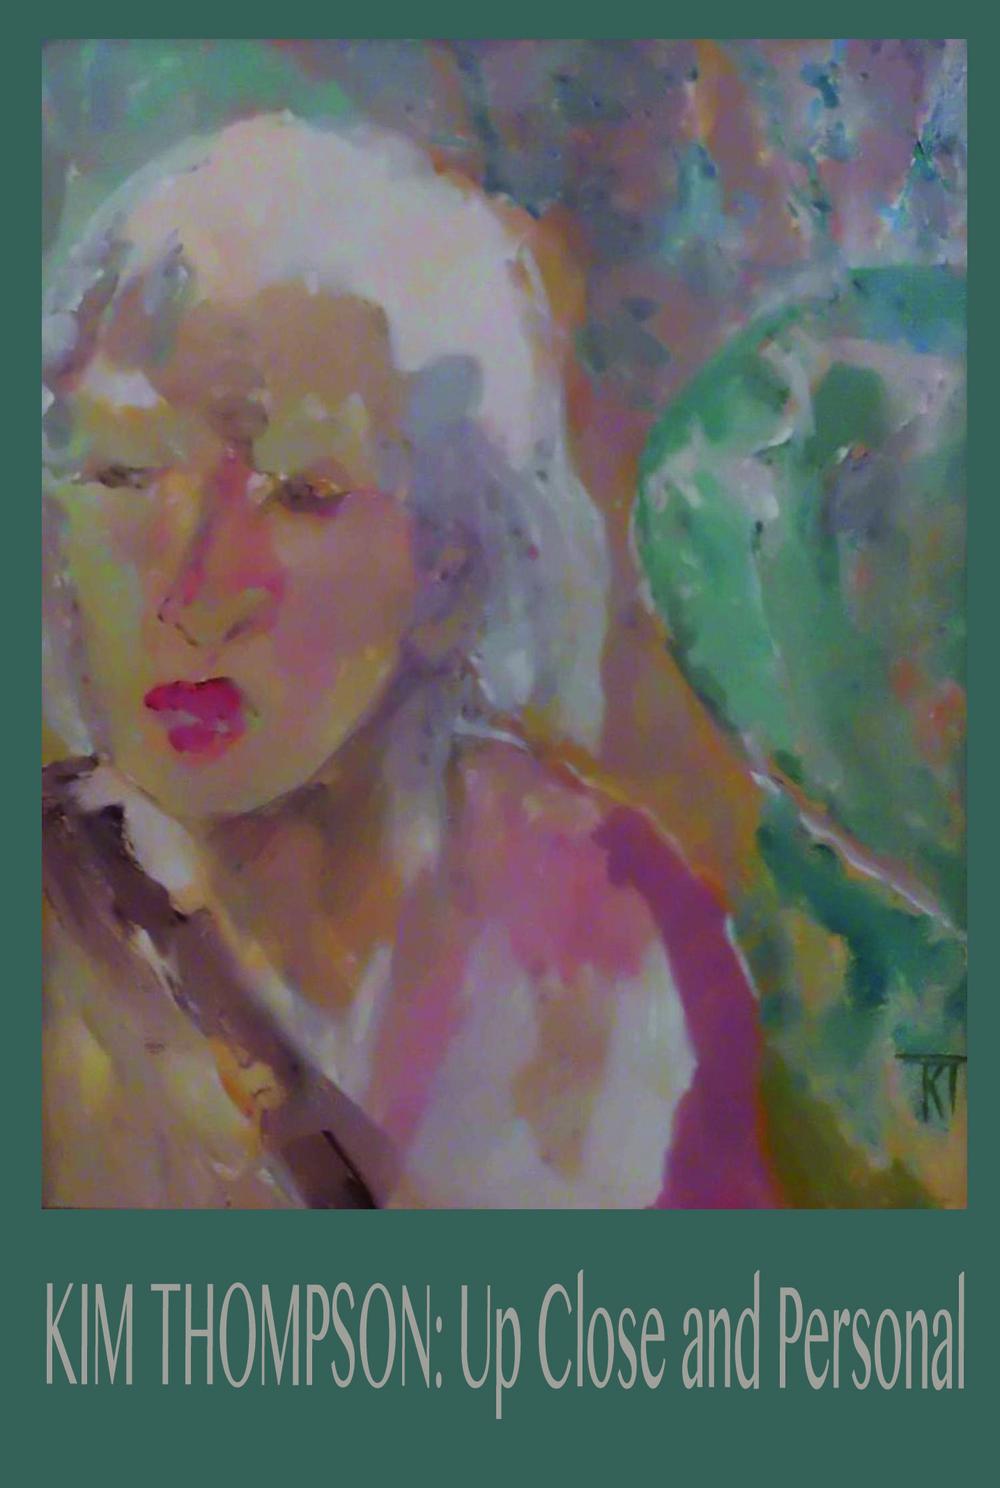 """Bernice"" by Kim Thompson, 2013. 16"" x 20"", acrylic."